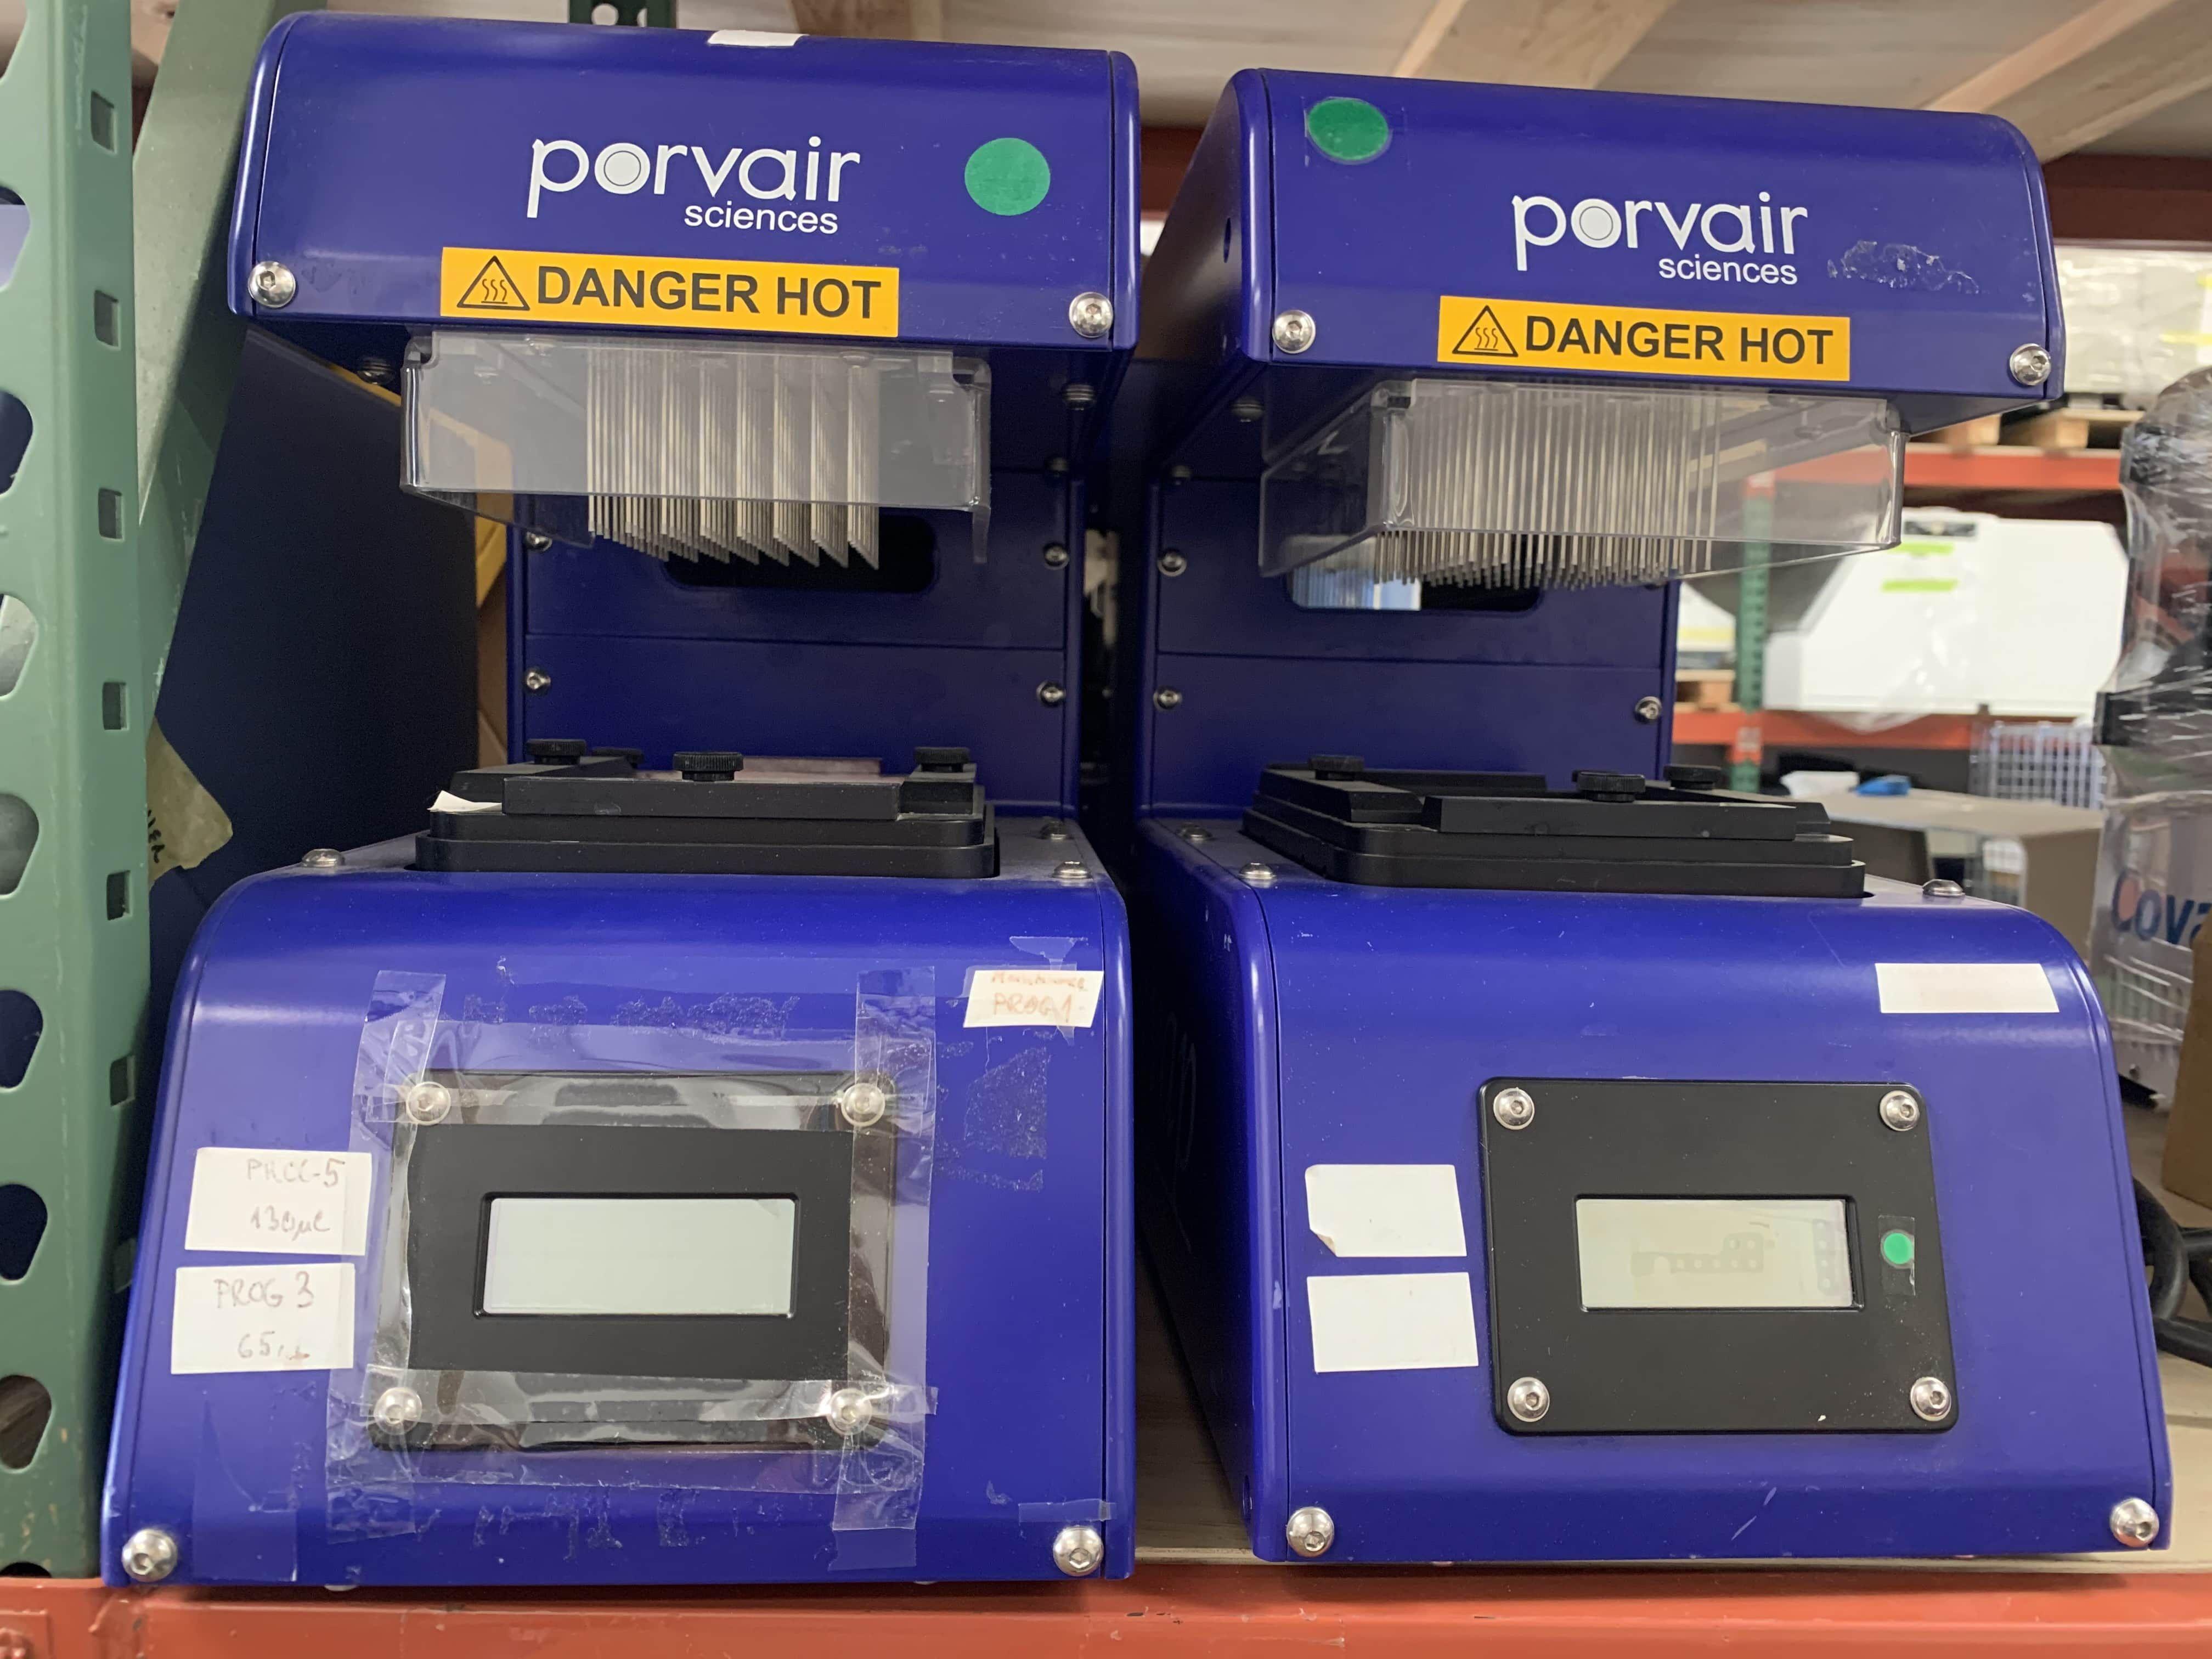 Porvair Sciences Evaporators Model Ultravap with Warranty